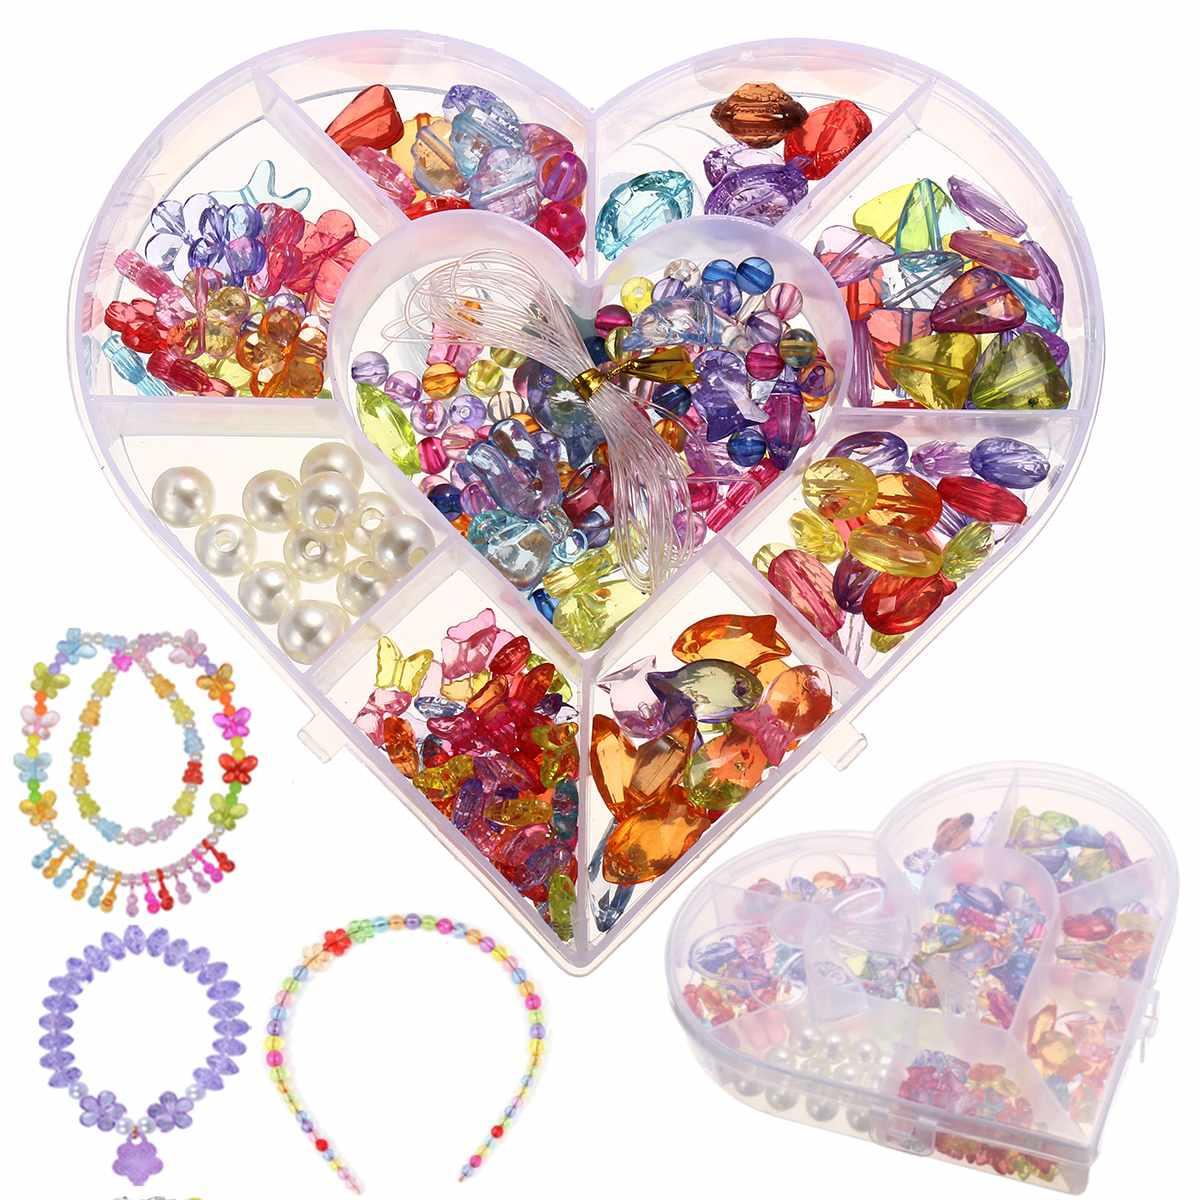 Crystal Series DIY Craft Beads Kit For Girls Kids Birthday Gift Educational Toy